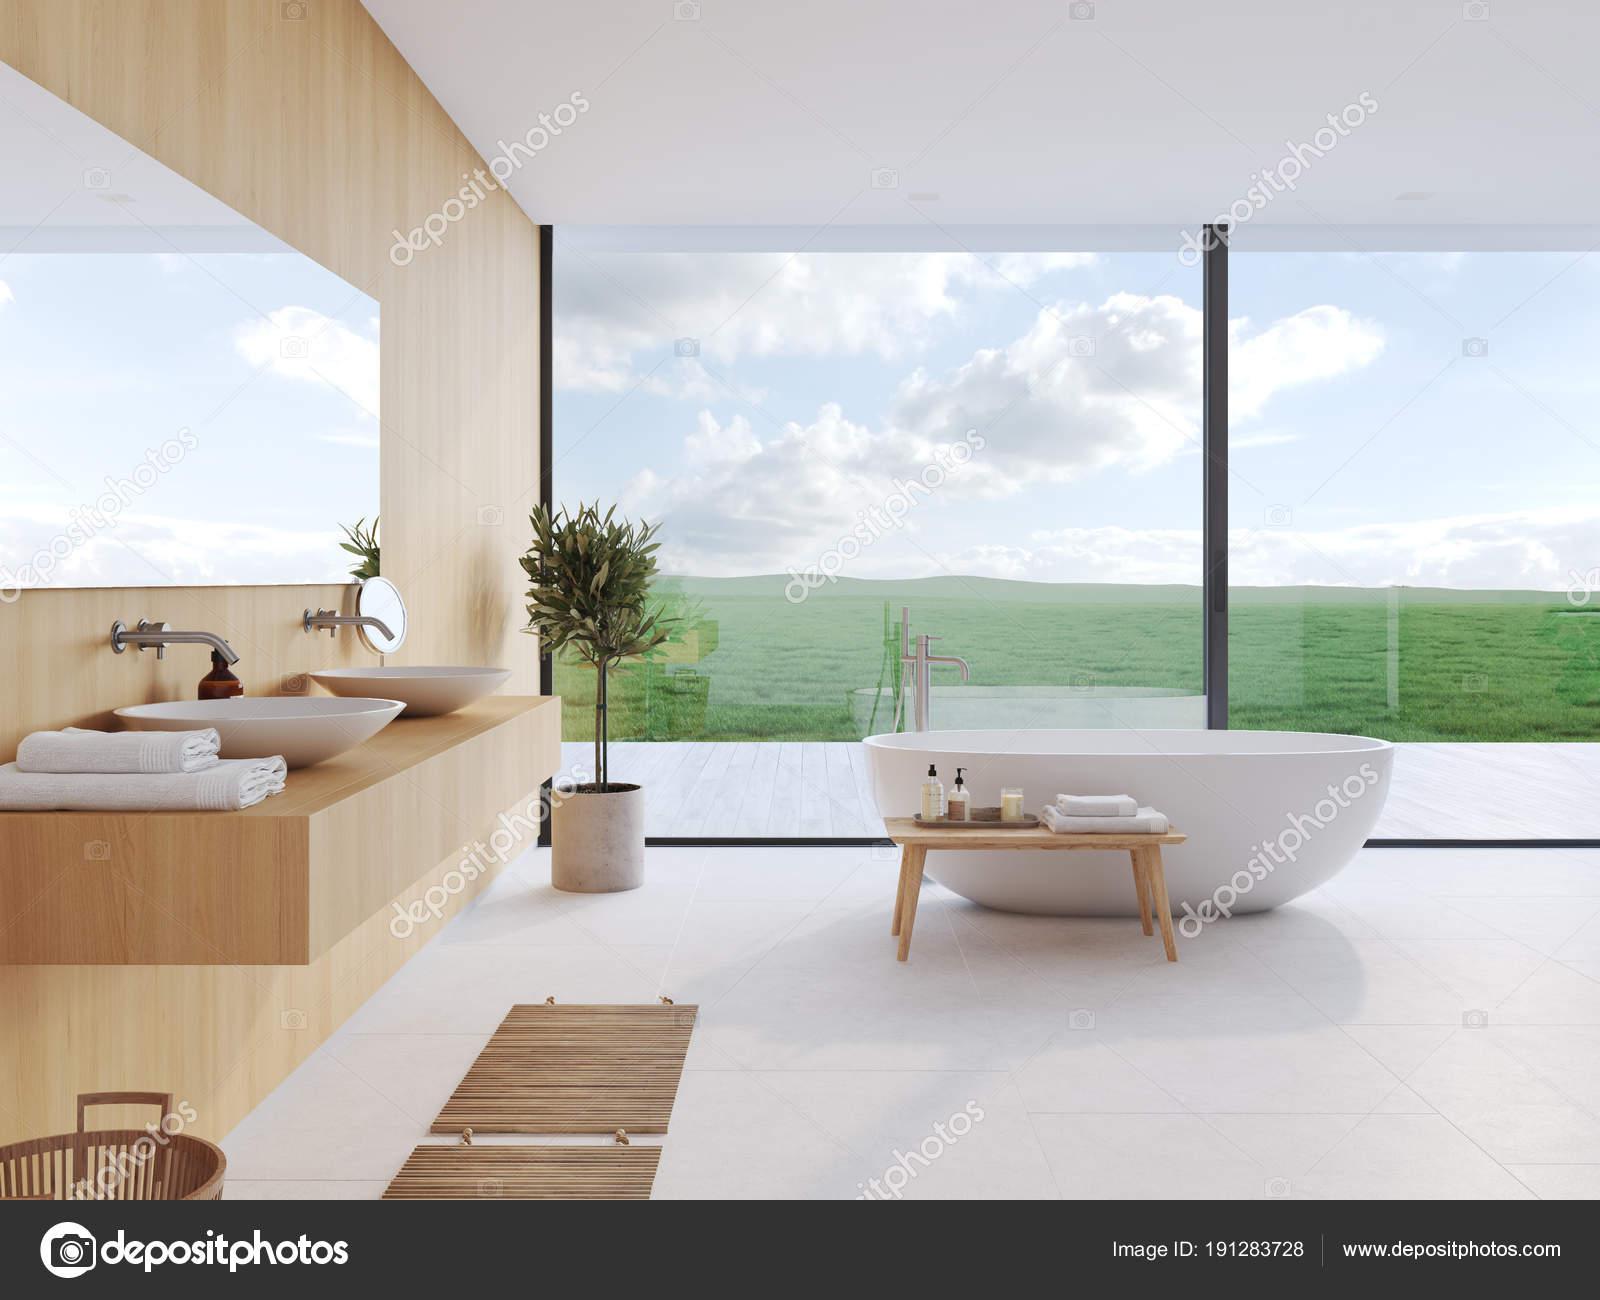 Mooie Moderne Badkamers : Nieuwe moderne badkamer met een mooi uitzicht. 3d rendering